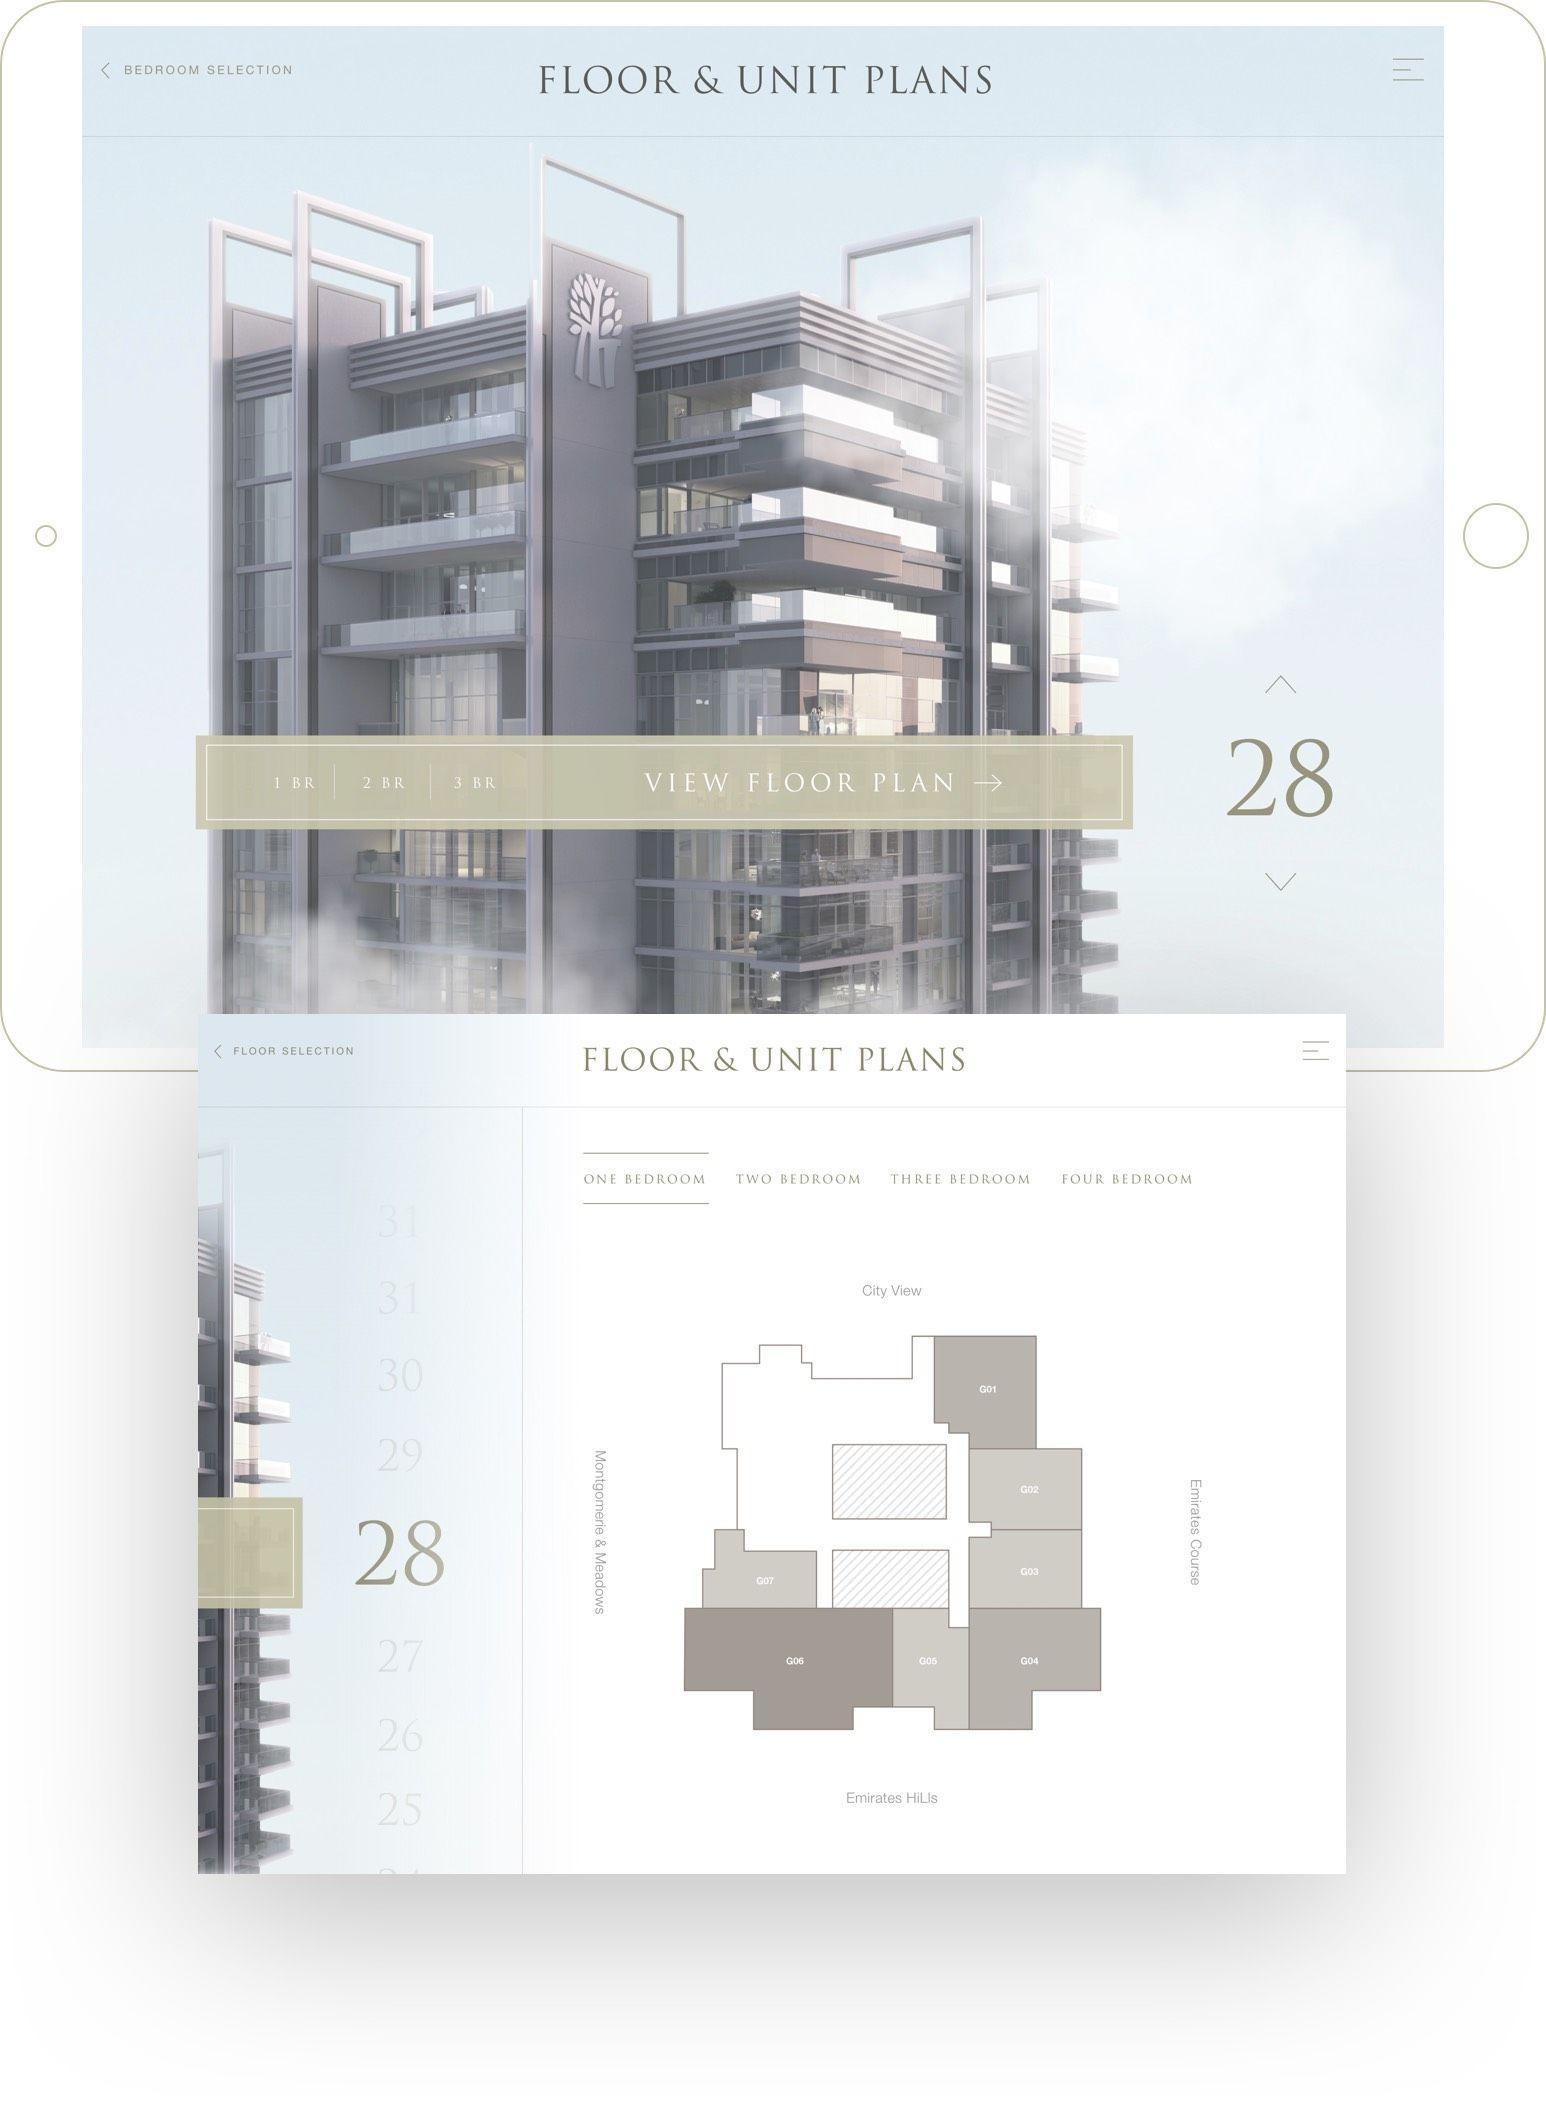 banyan-app-image-2.jpg